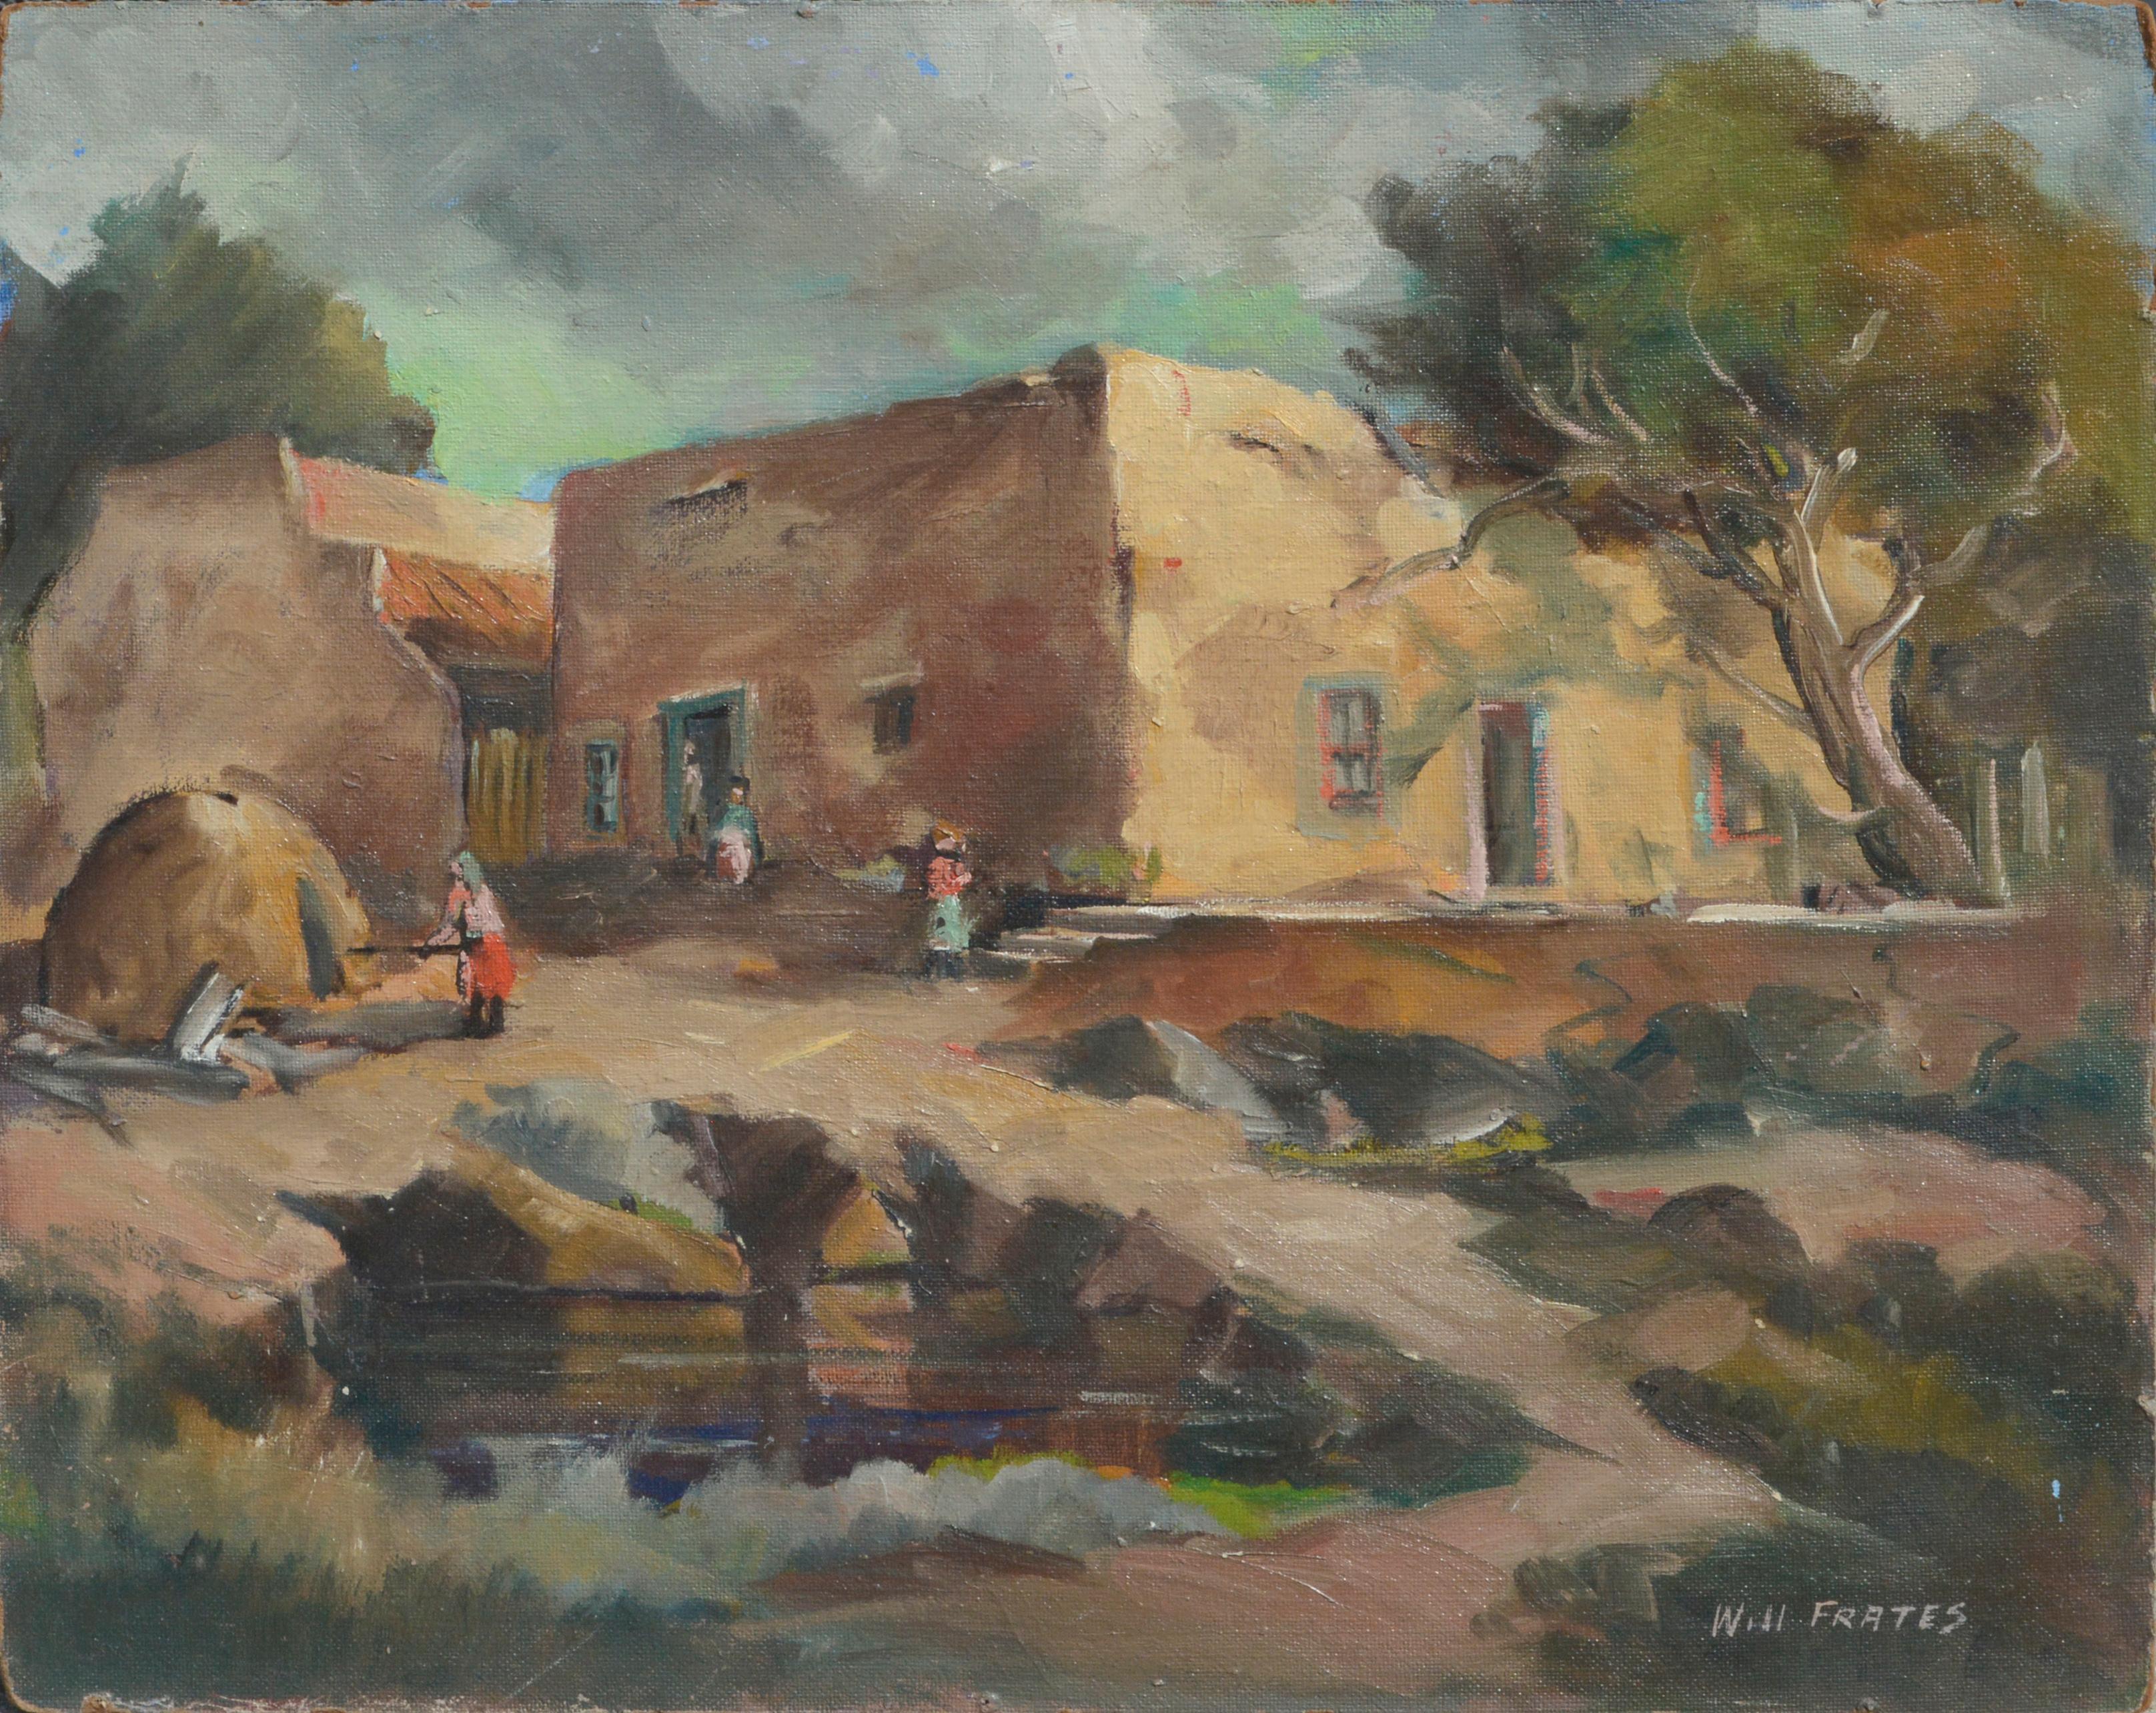 Mid Century Pueblo Village New Mexico - Southwestern Figurative Landscape